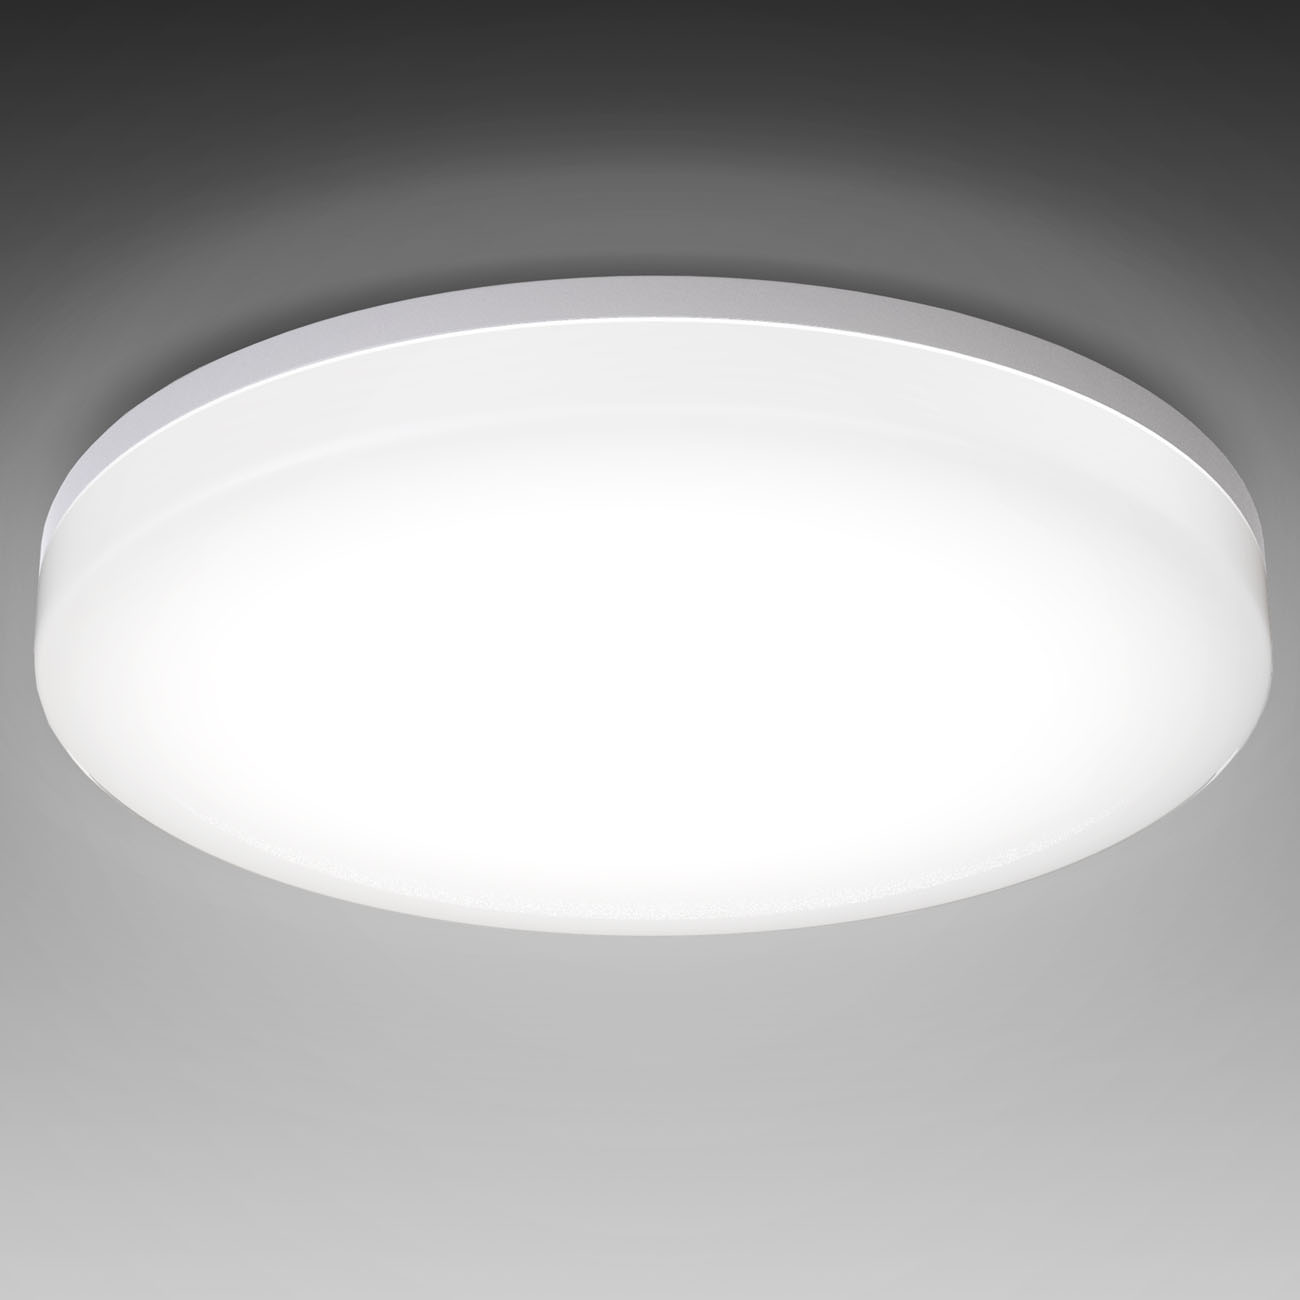 LED Deckenleuchte Badlampe IP54 L - 3